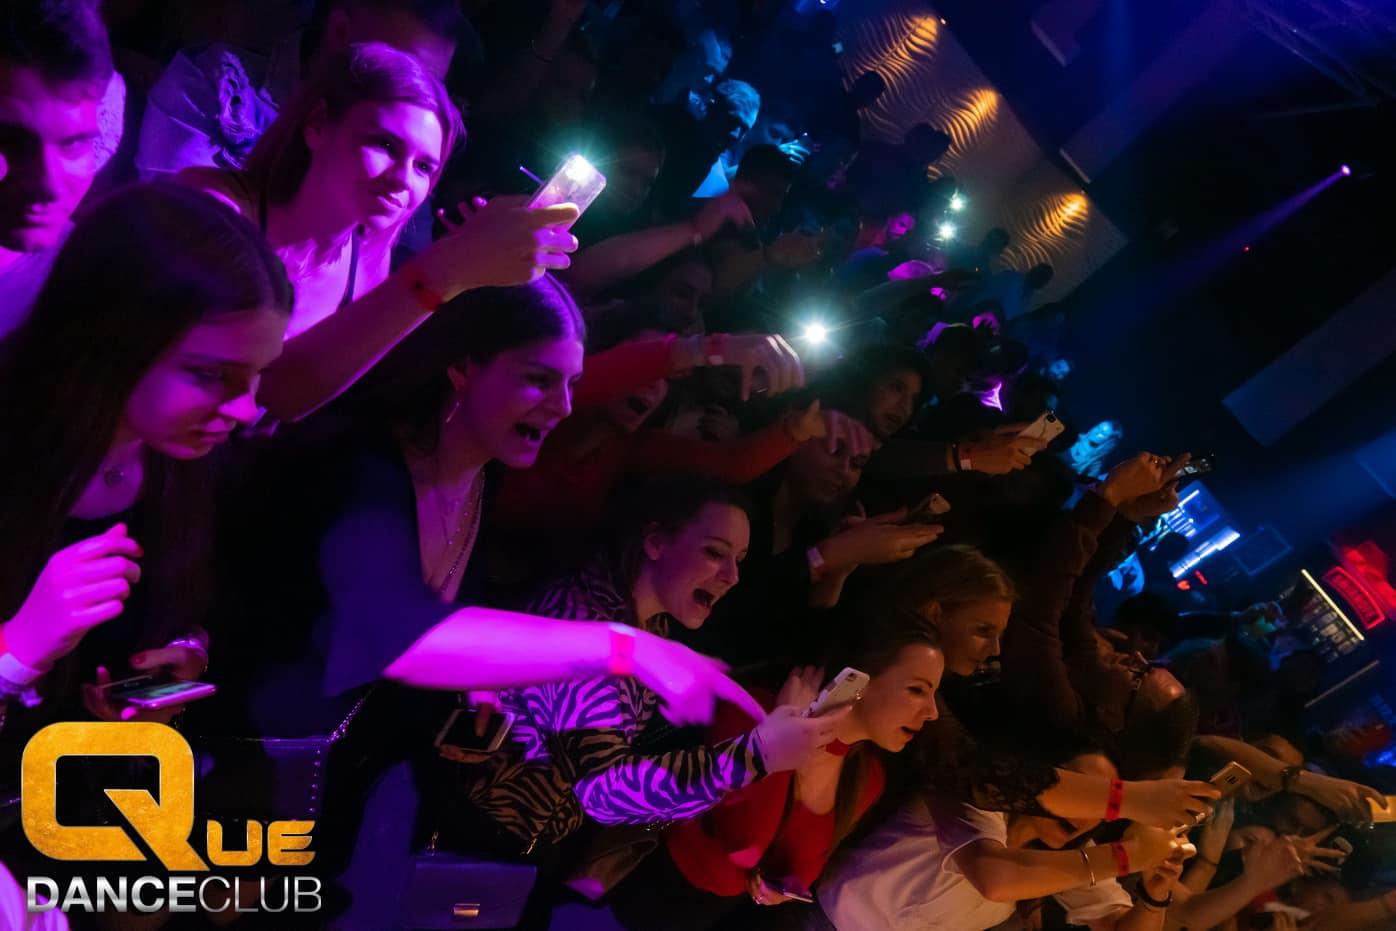 2018_12_08_Que_Danceclub_Paparazzo_Night_Ardian_Bujupi_Live_Nightlife_Scene_Timo_056